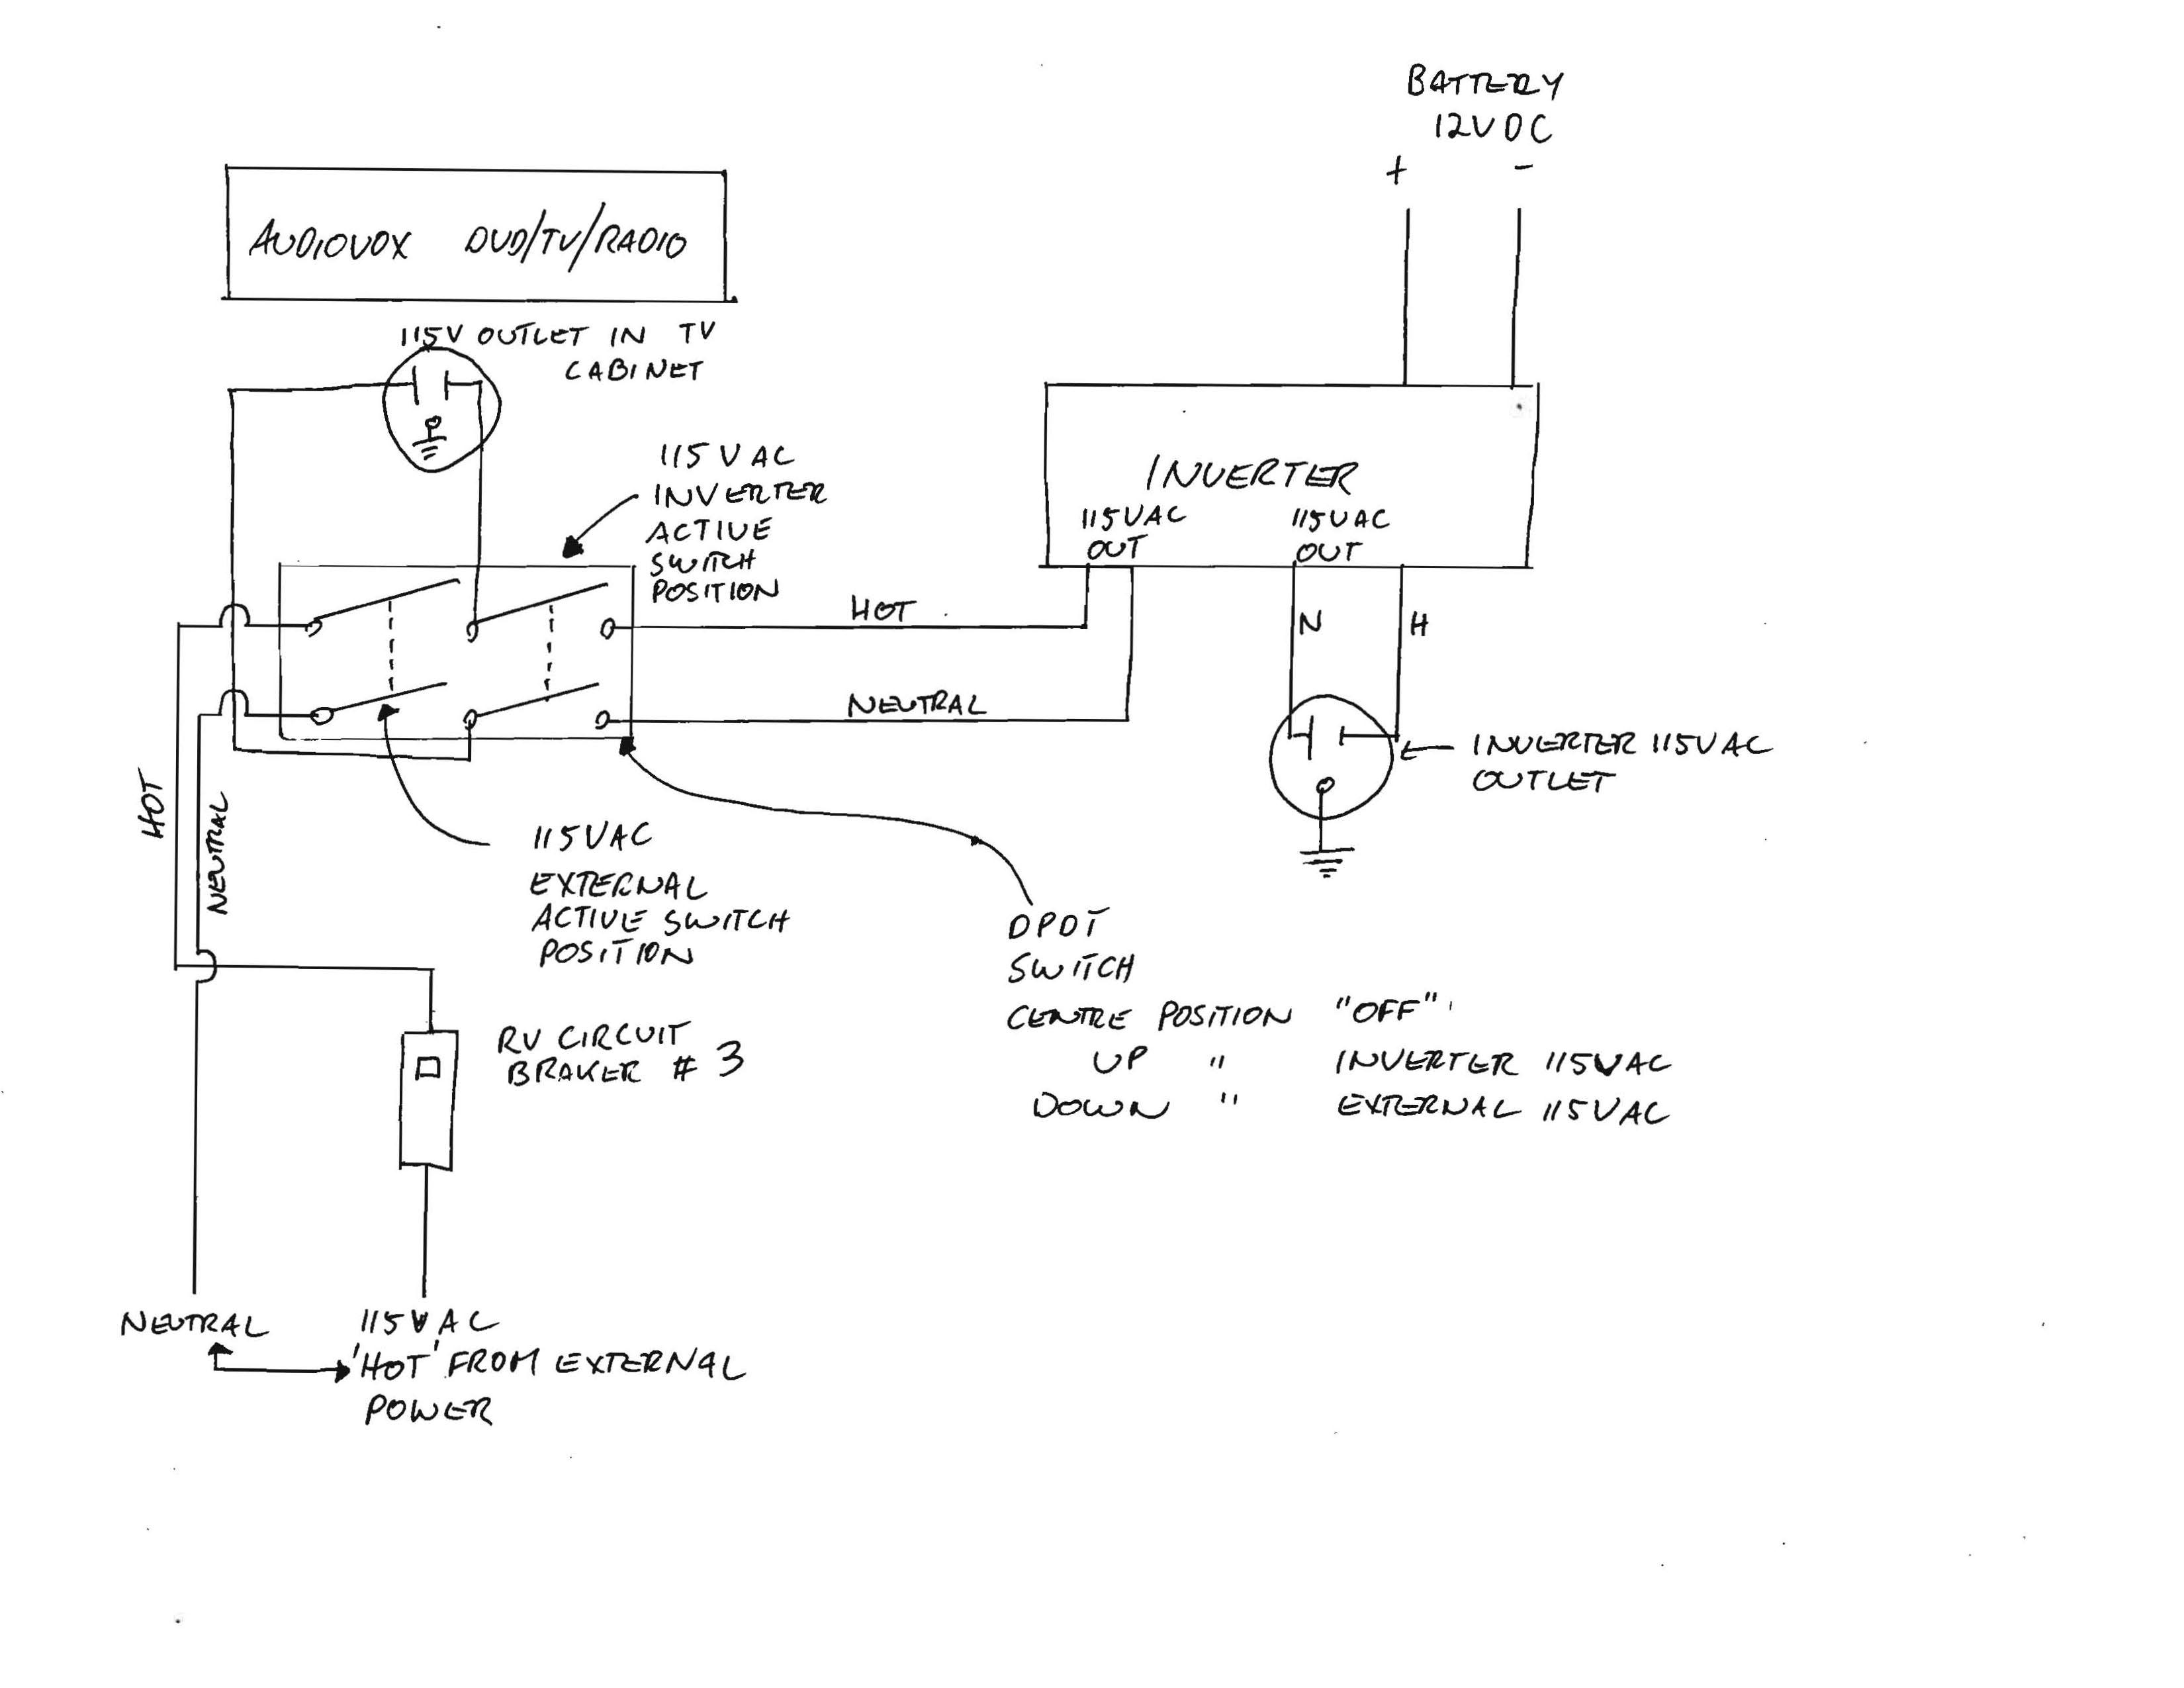 smeg range cooker wiring diagram volvo tractor fuse box 400 xs, Wiring diagram